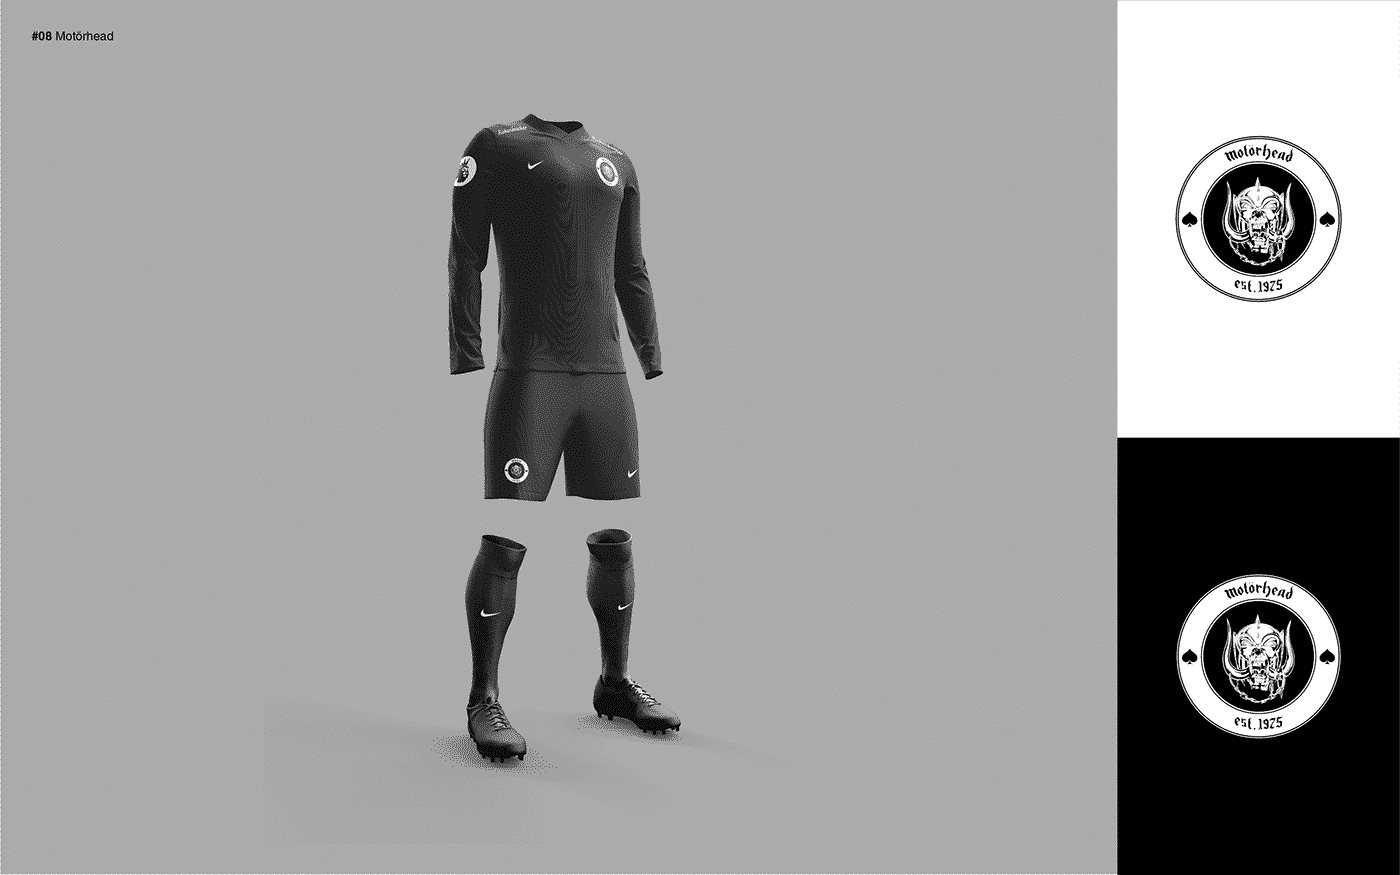 Premier-League-2018-Rock-Edition-Matheus-de-Souza-Viana-Motorhead-img1